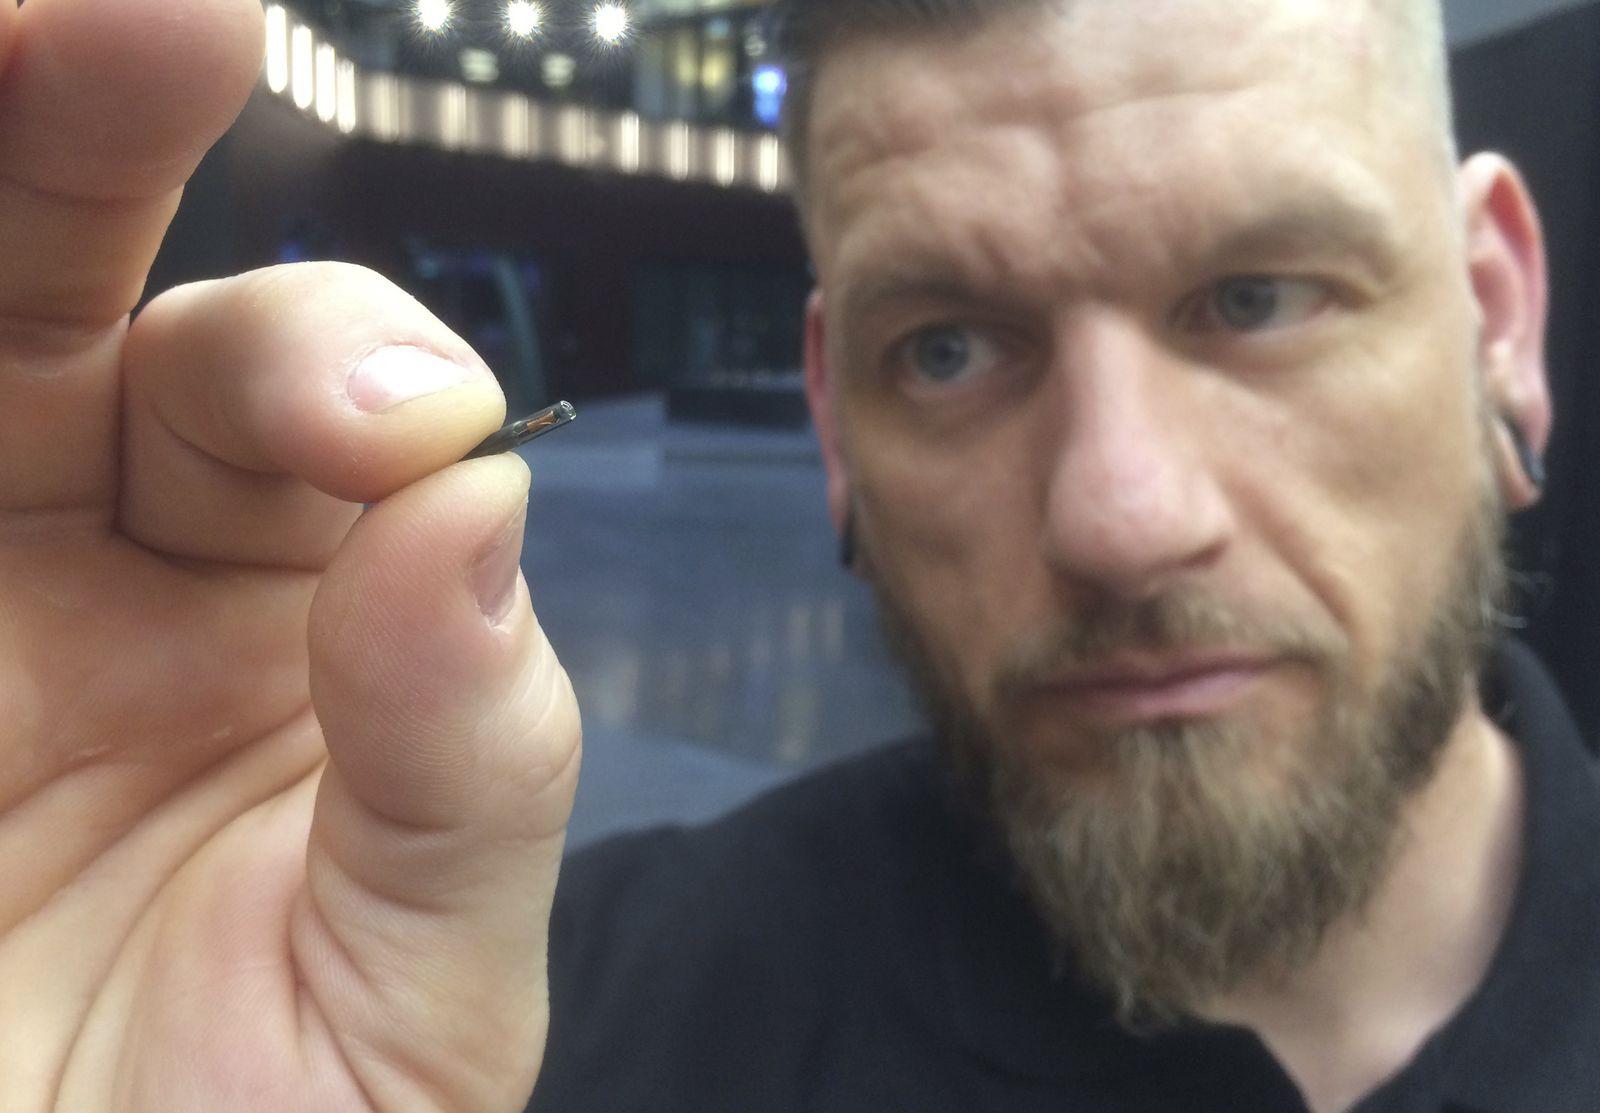 Sweden Microchip Implants